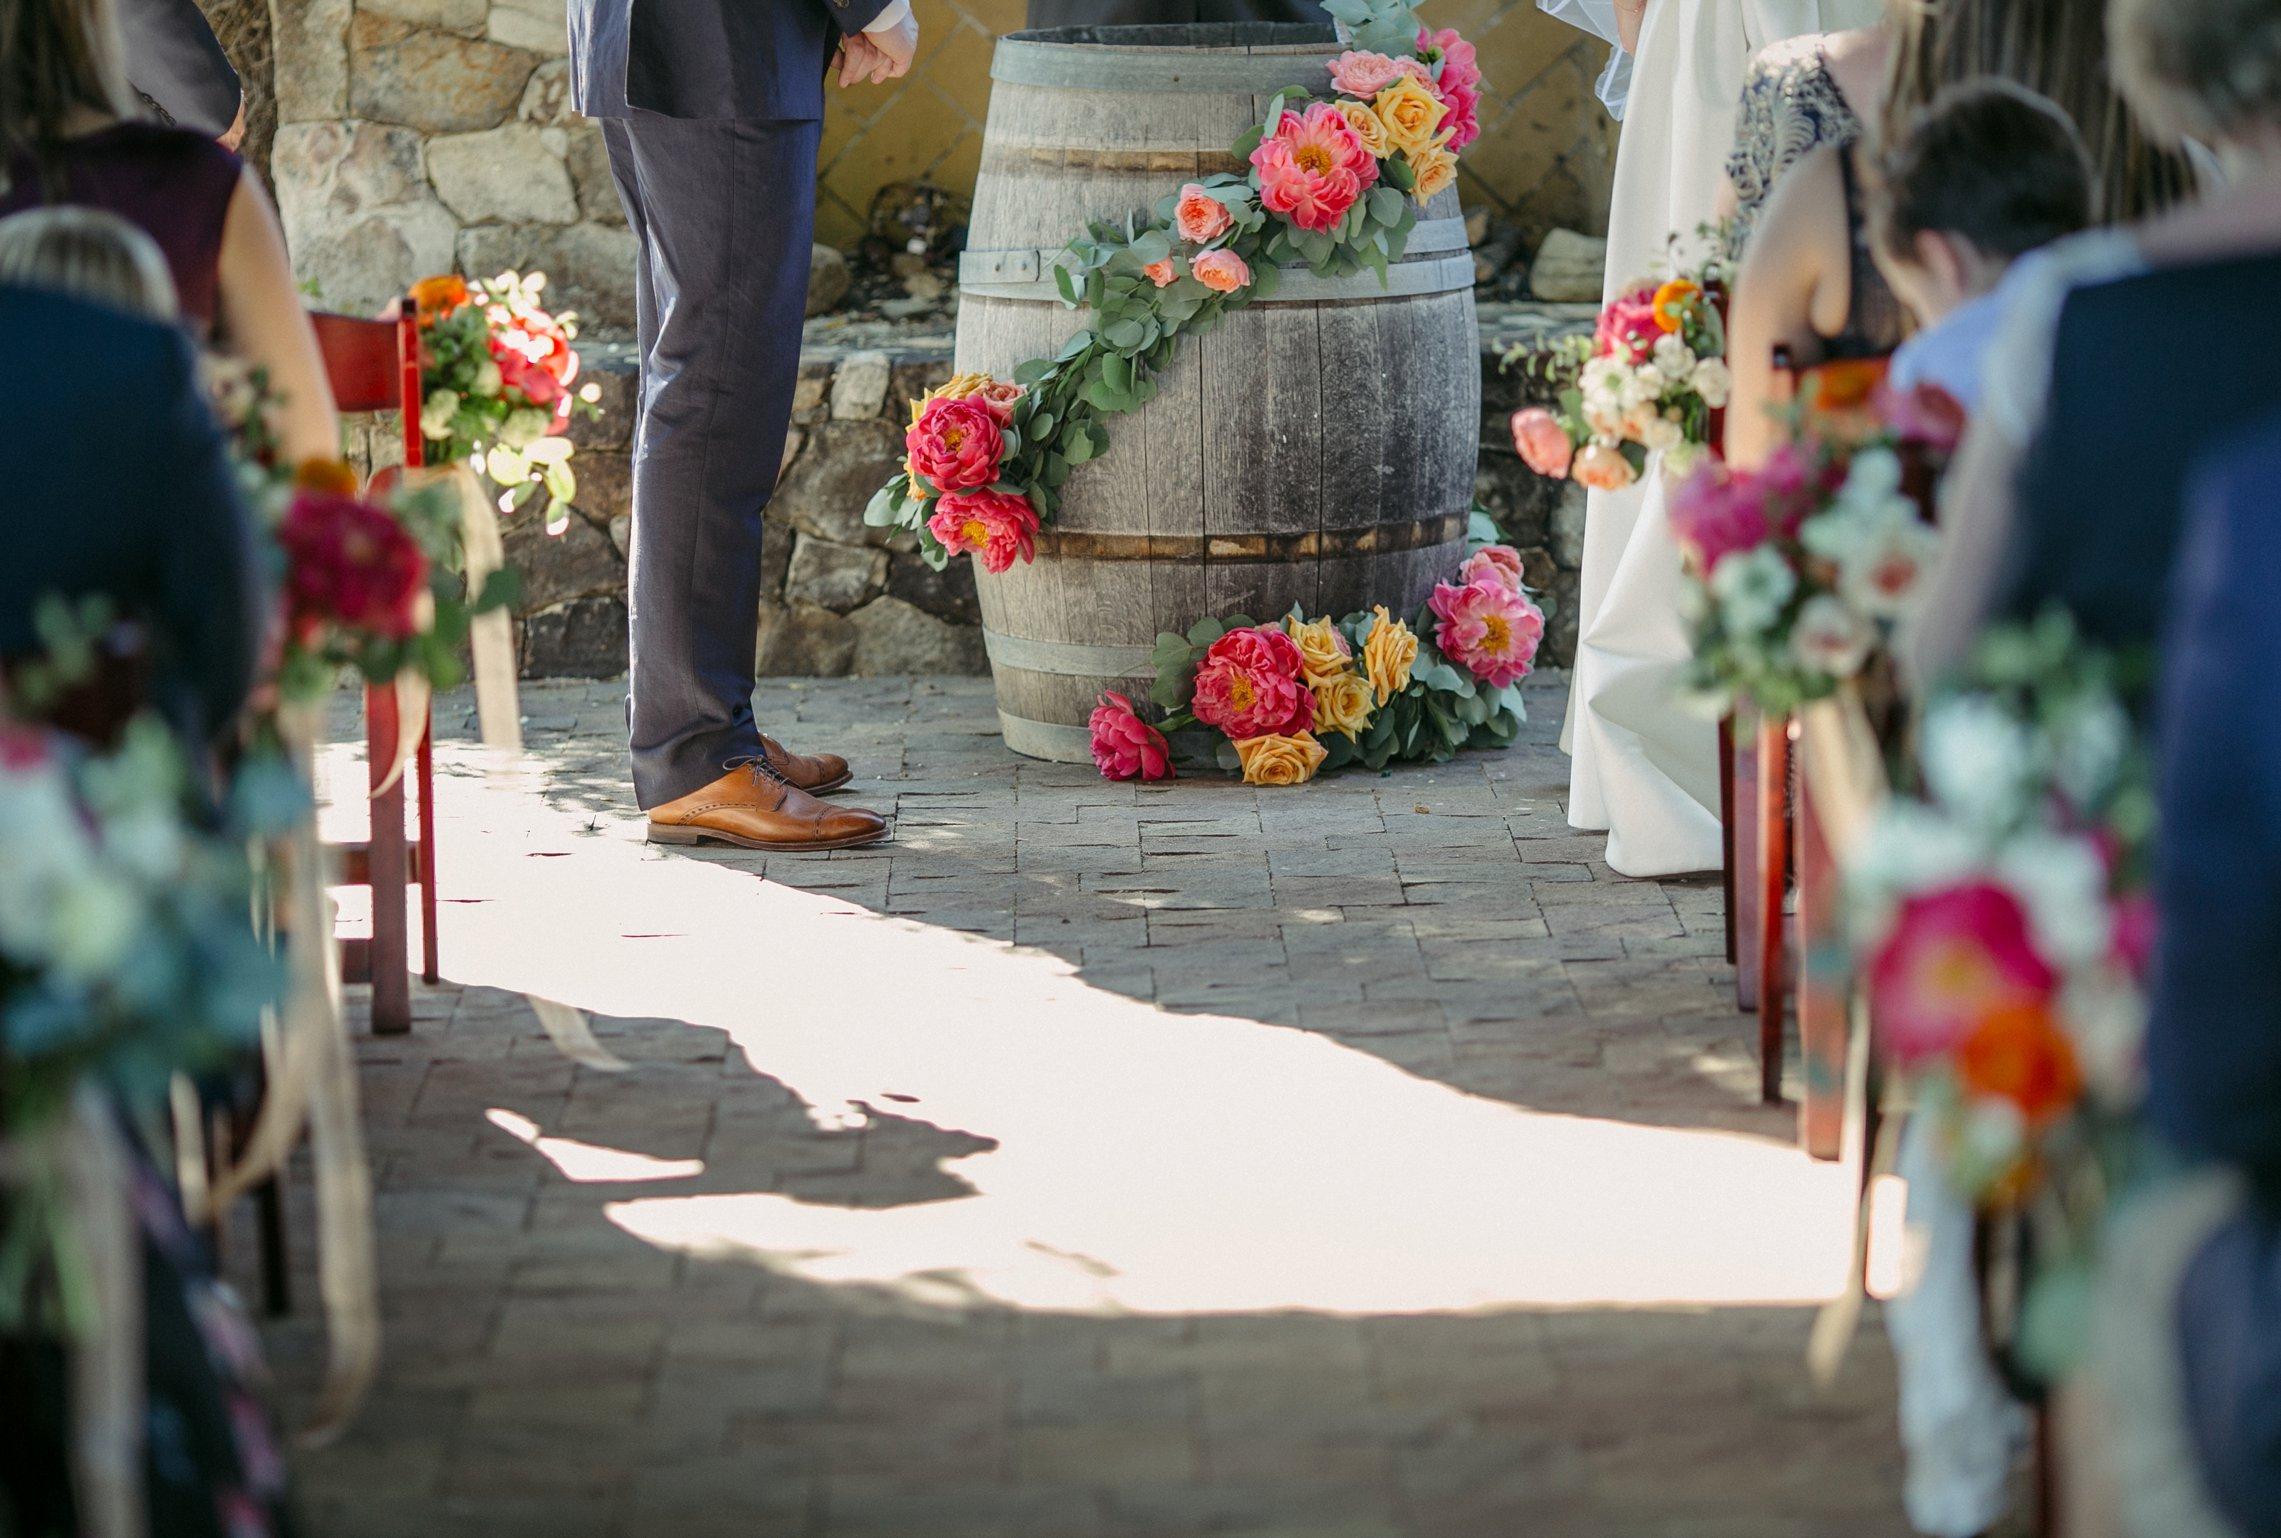 Healdsburg_Dutcher_Crossing_Winery_Wedding_0006.jpg